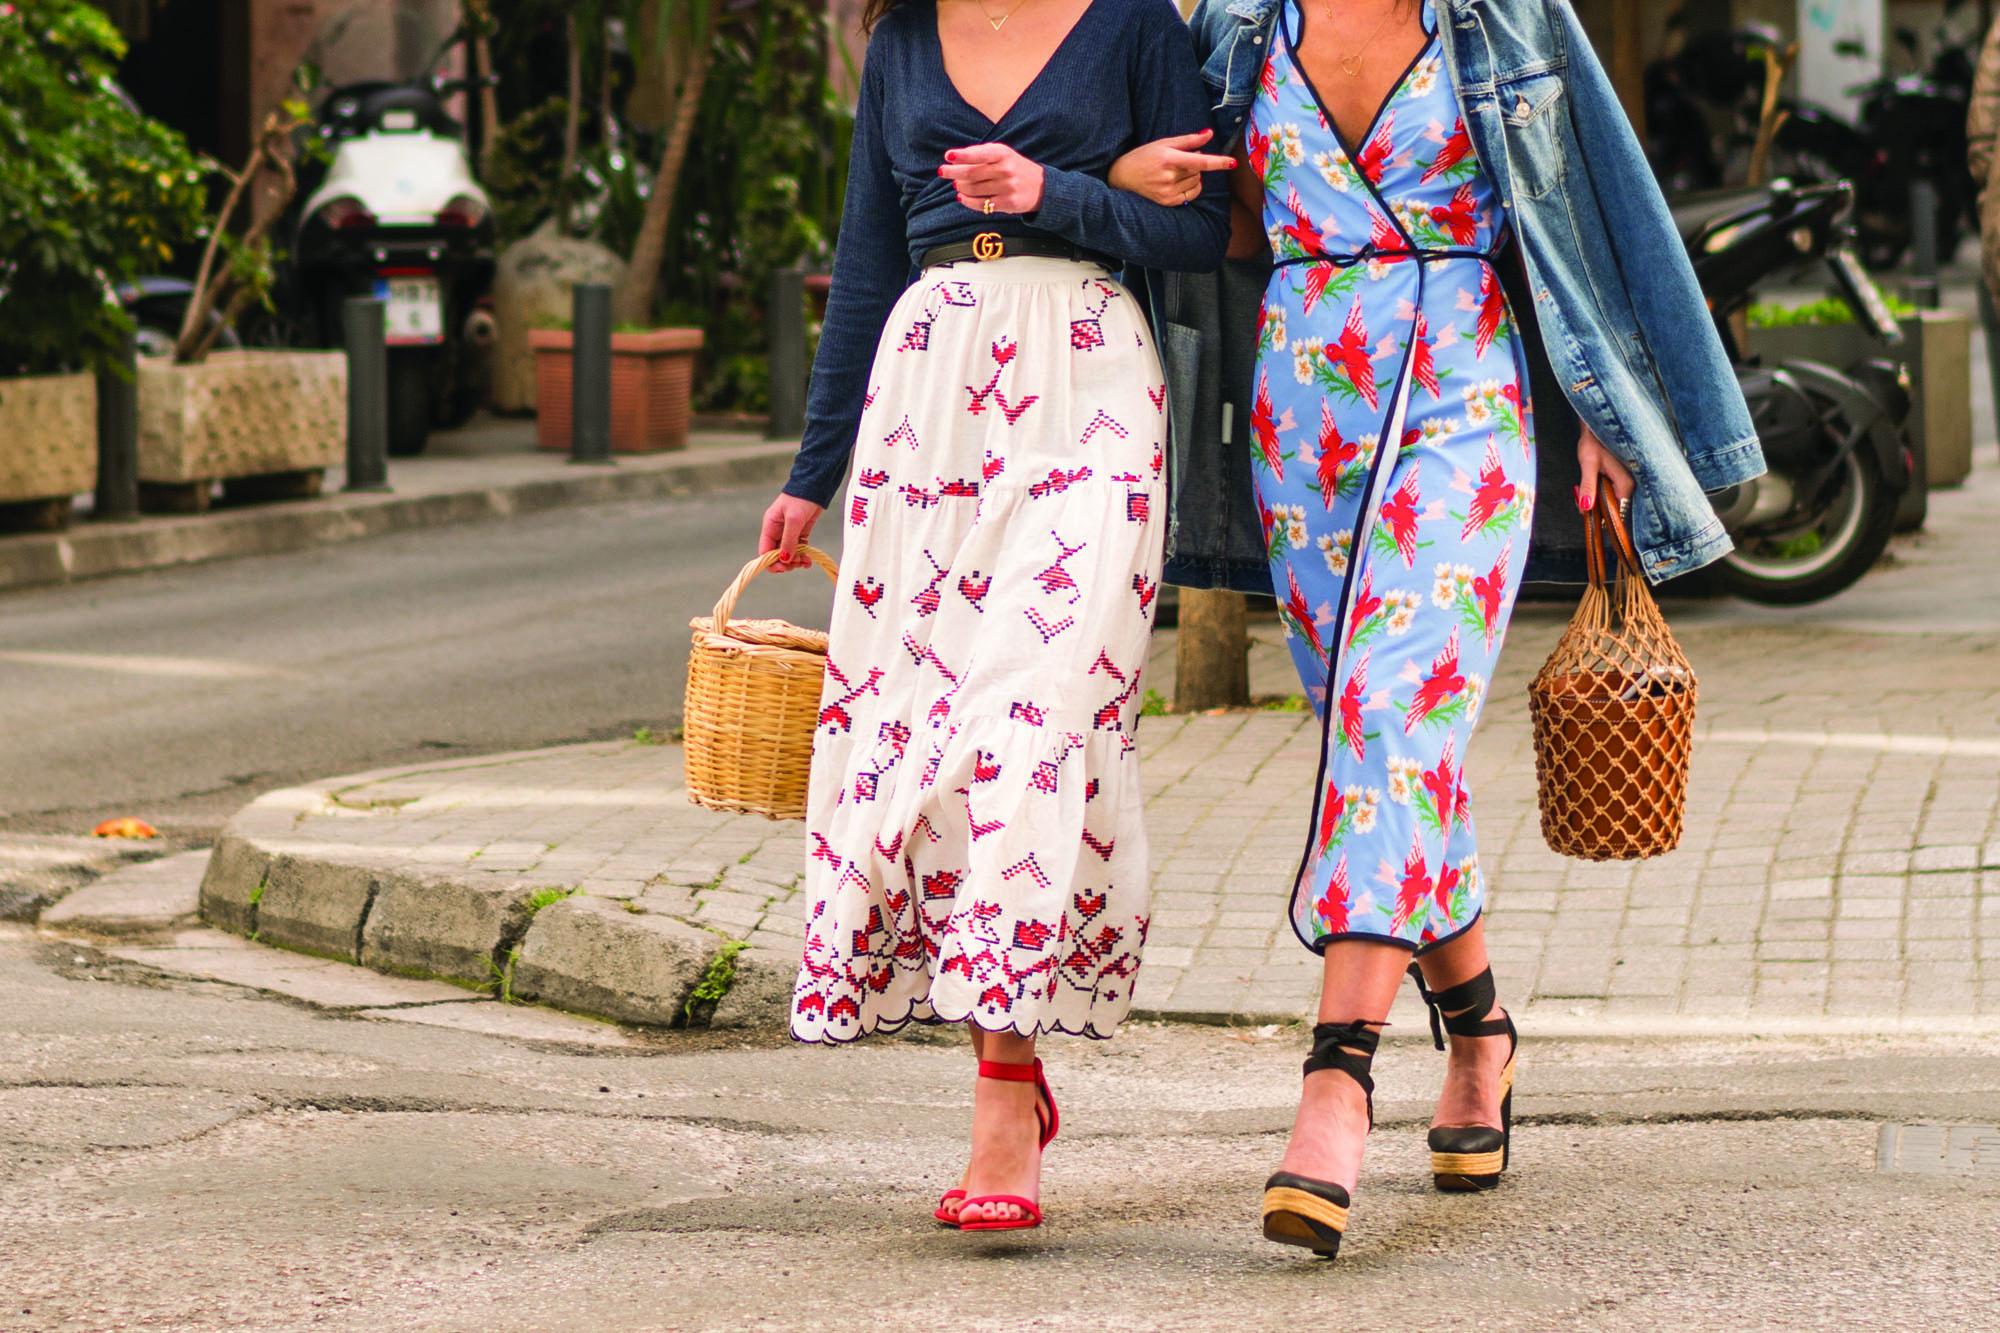 2dbeb2091326 Οι συλλογές του ελληνικού brand Karavan Clothing αποτελούνται από χειροποίητα  ρούχα